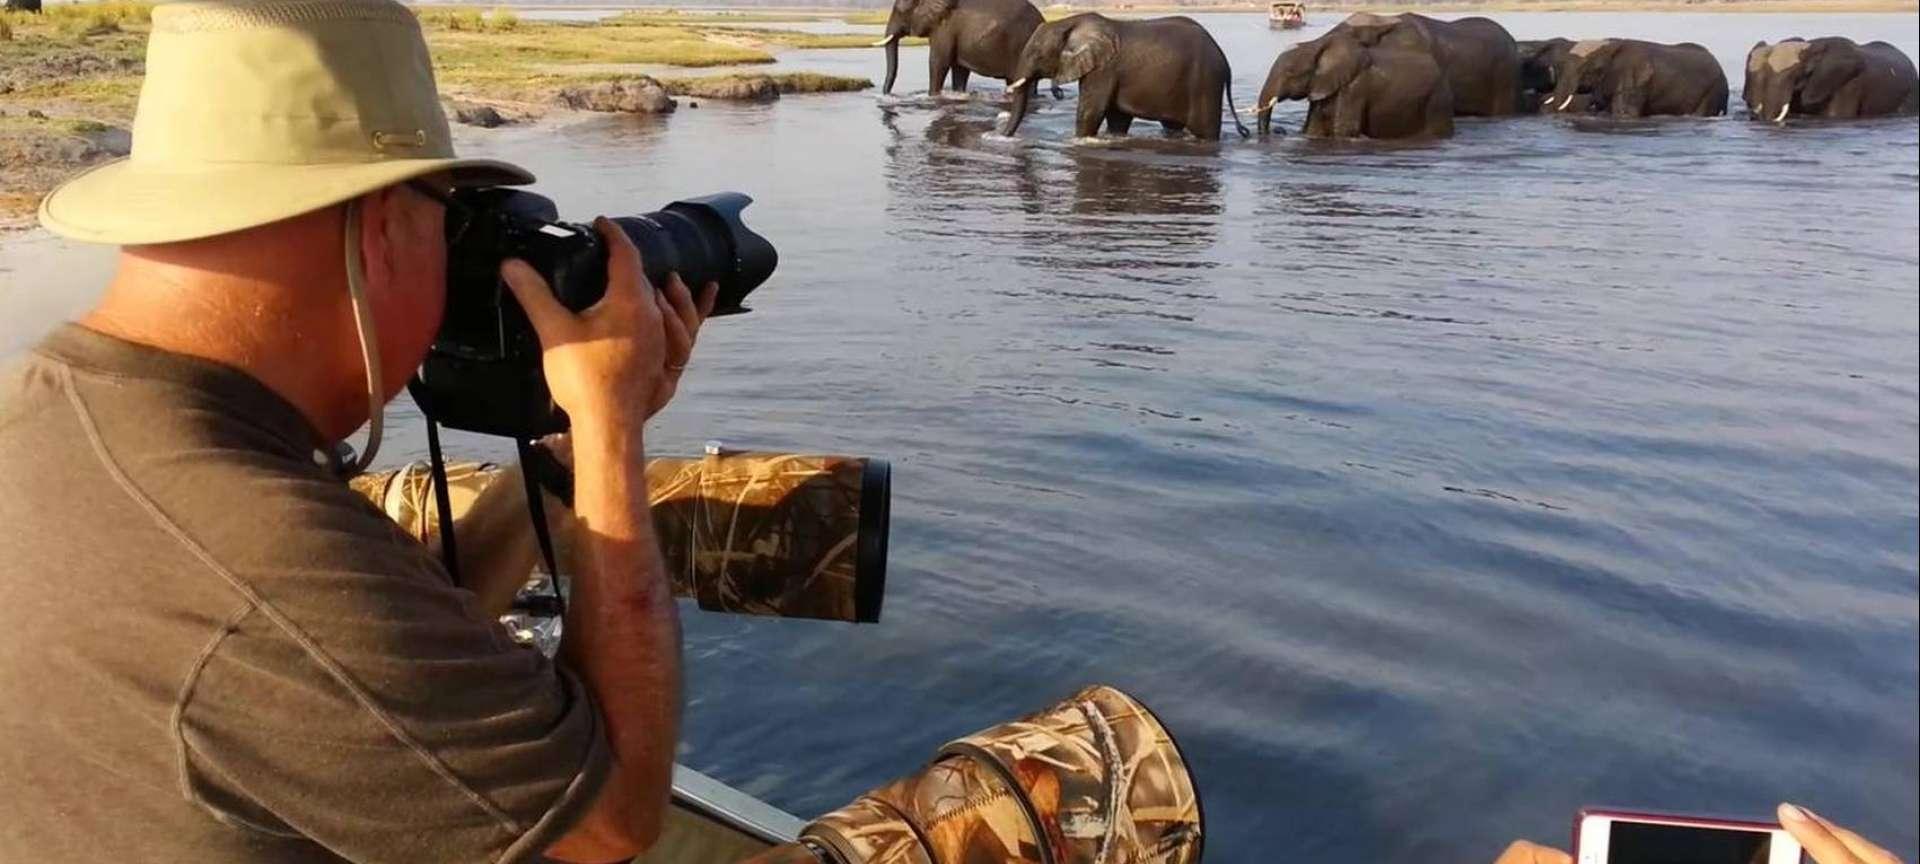 Houseboat safaris in Africa - Africa Wildlife Safaris